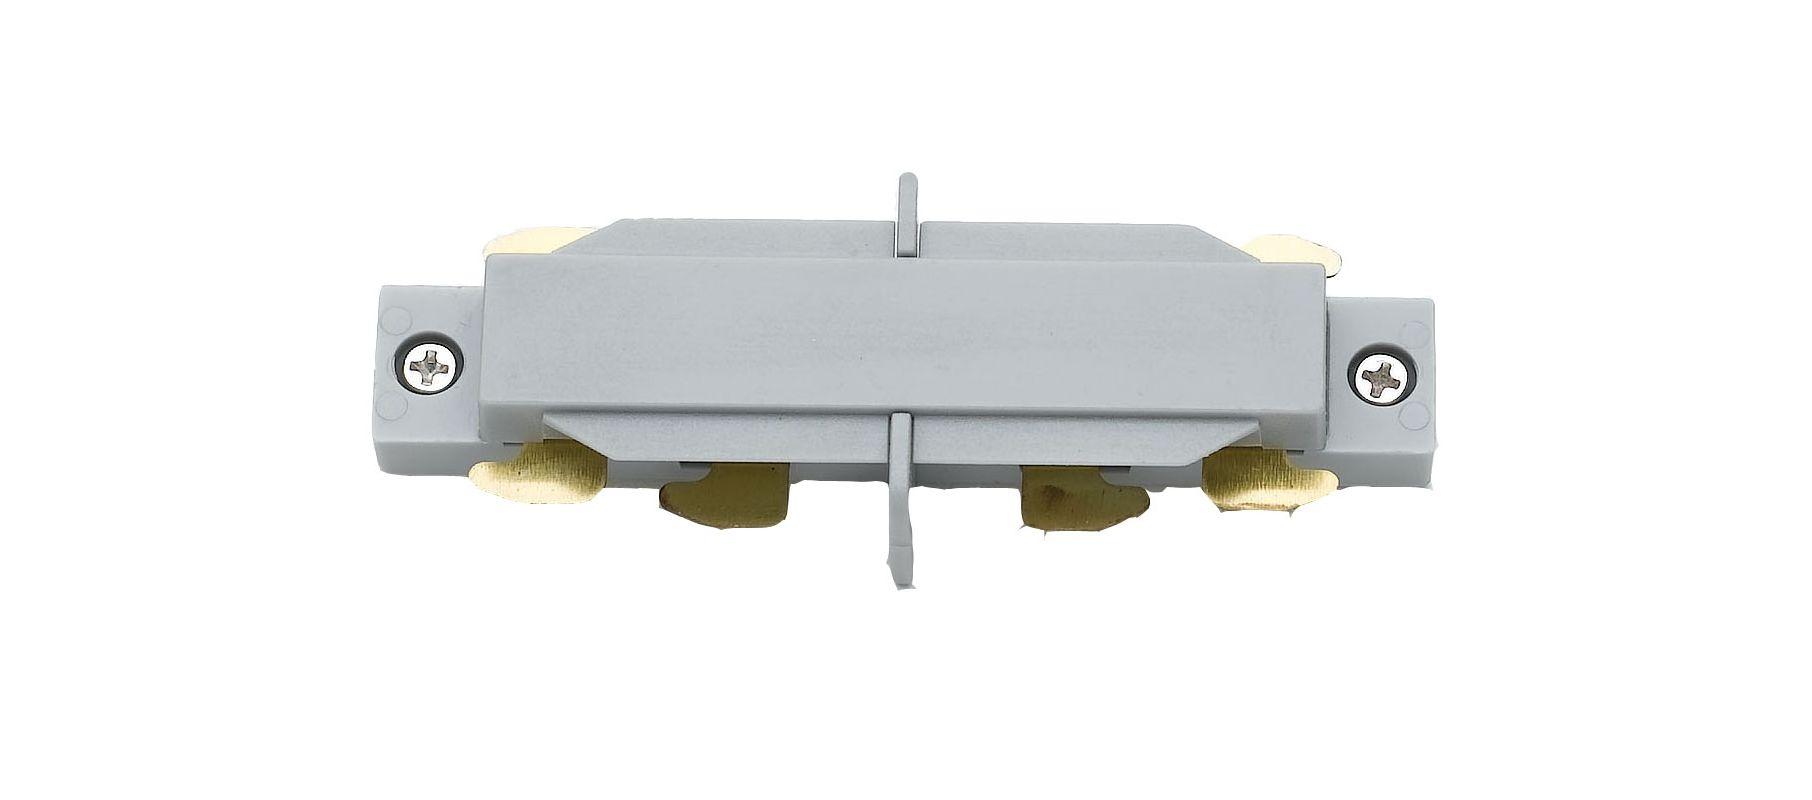 Prescolite AKTIL BL Straight Mini-Joiner for ArchiTrack Track Rail Sale $15.30 ITEM: bci1945856 ID#:AKTIL BL :